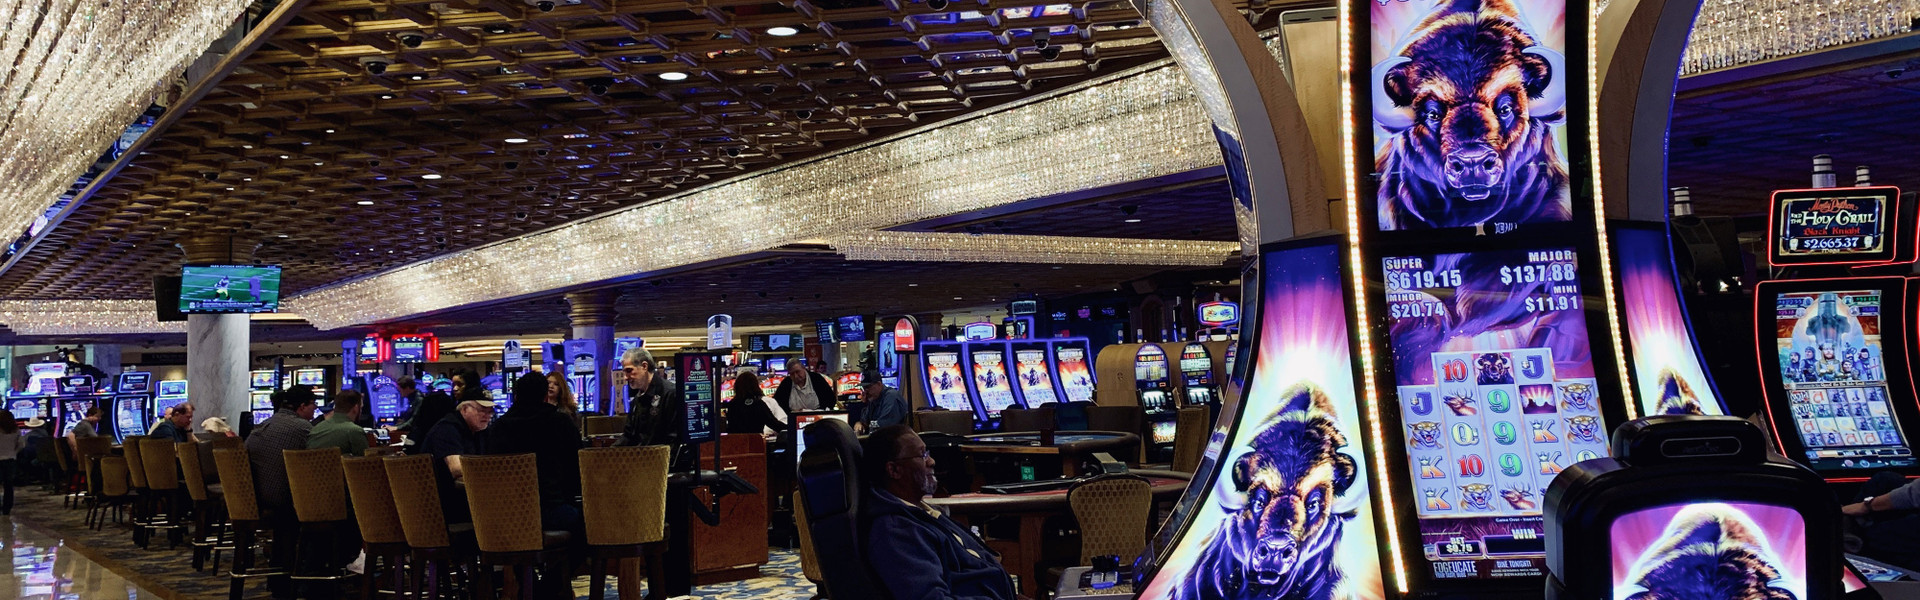 Sir Winston Westgate 25 000 Slot Tournament June 7 8